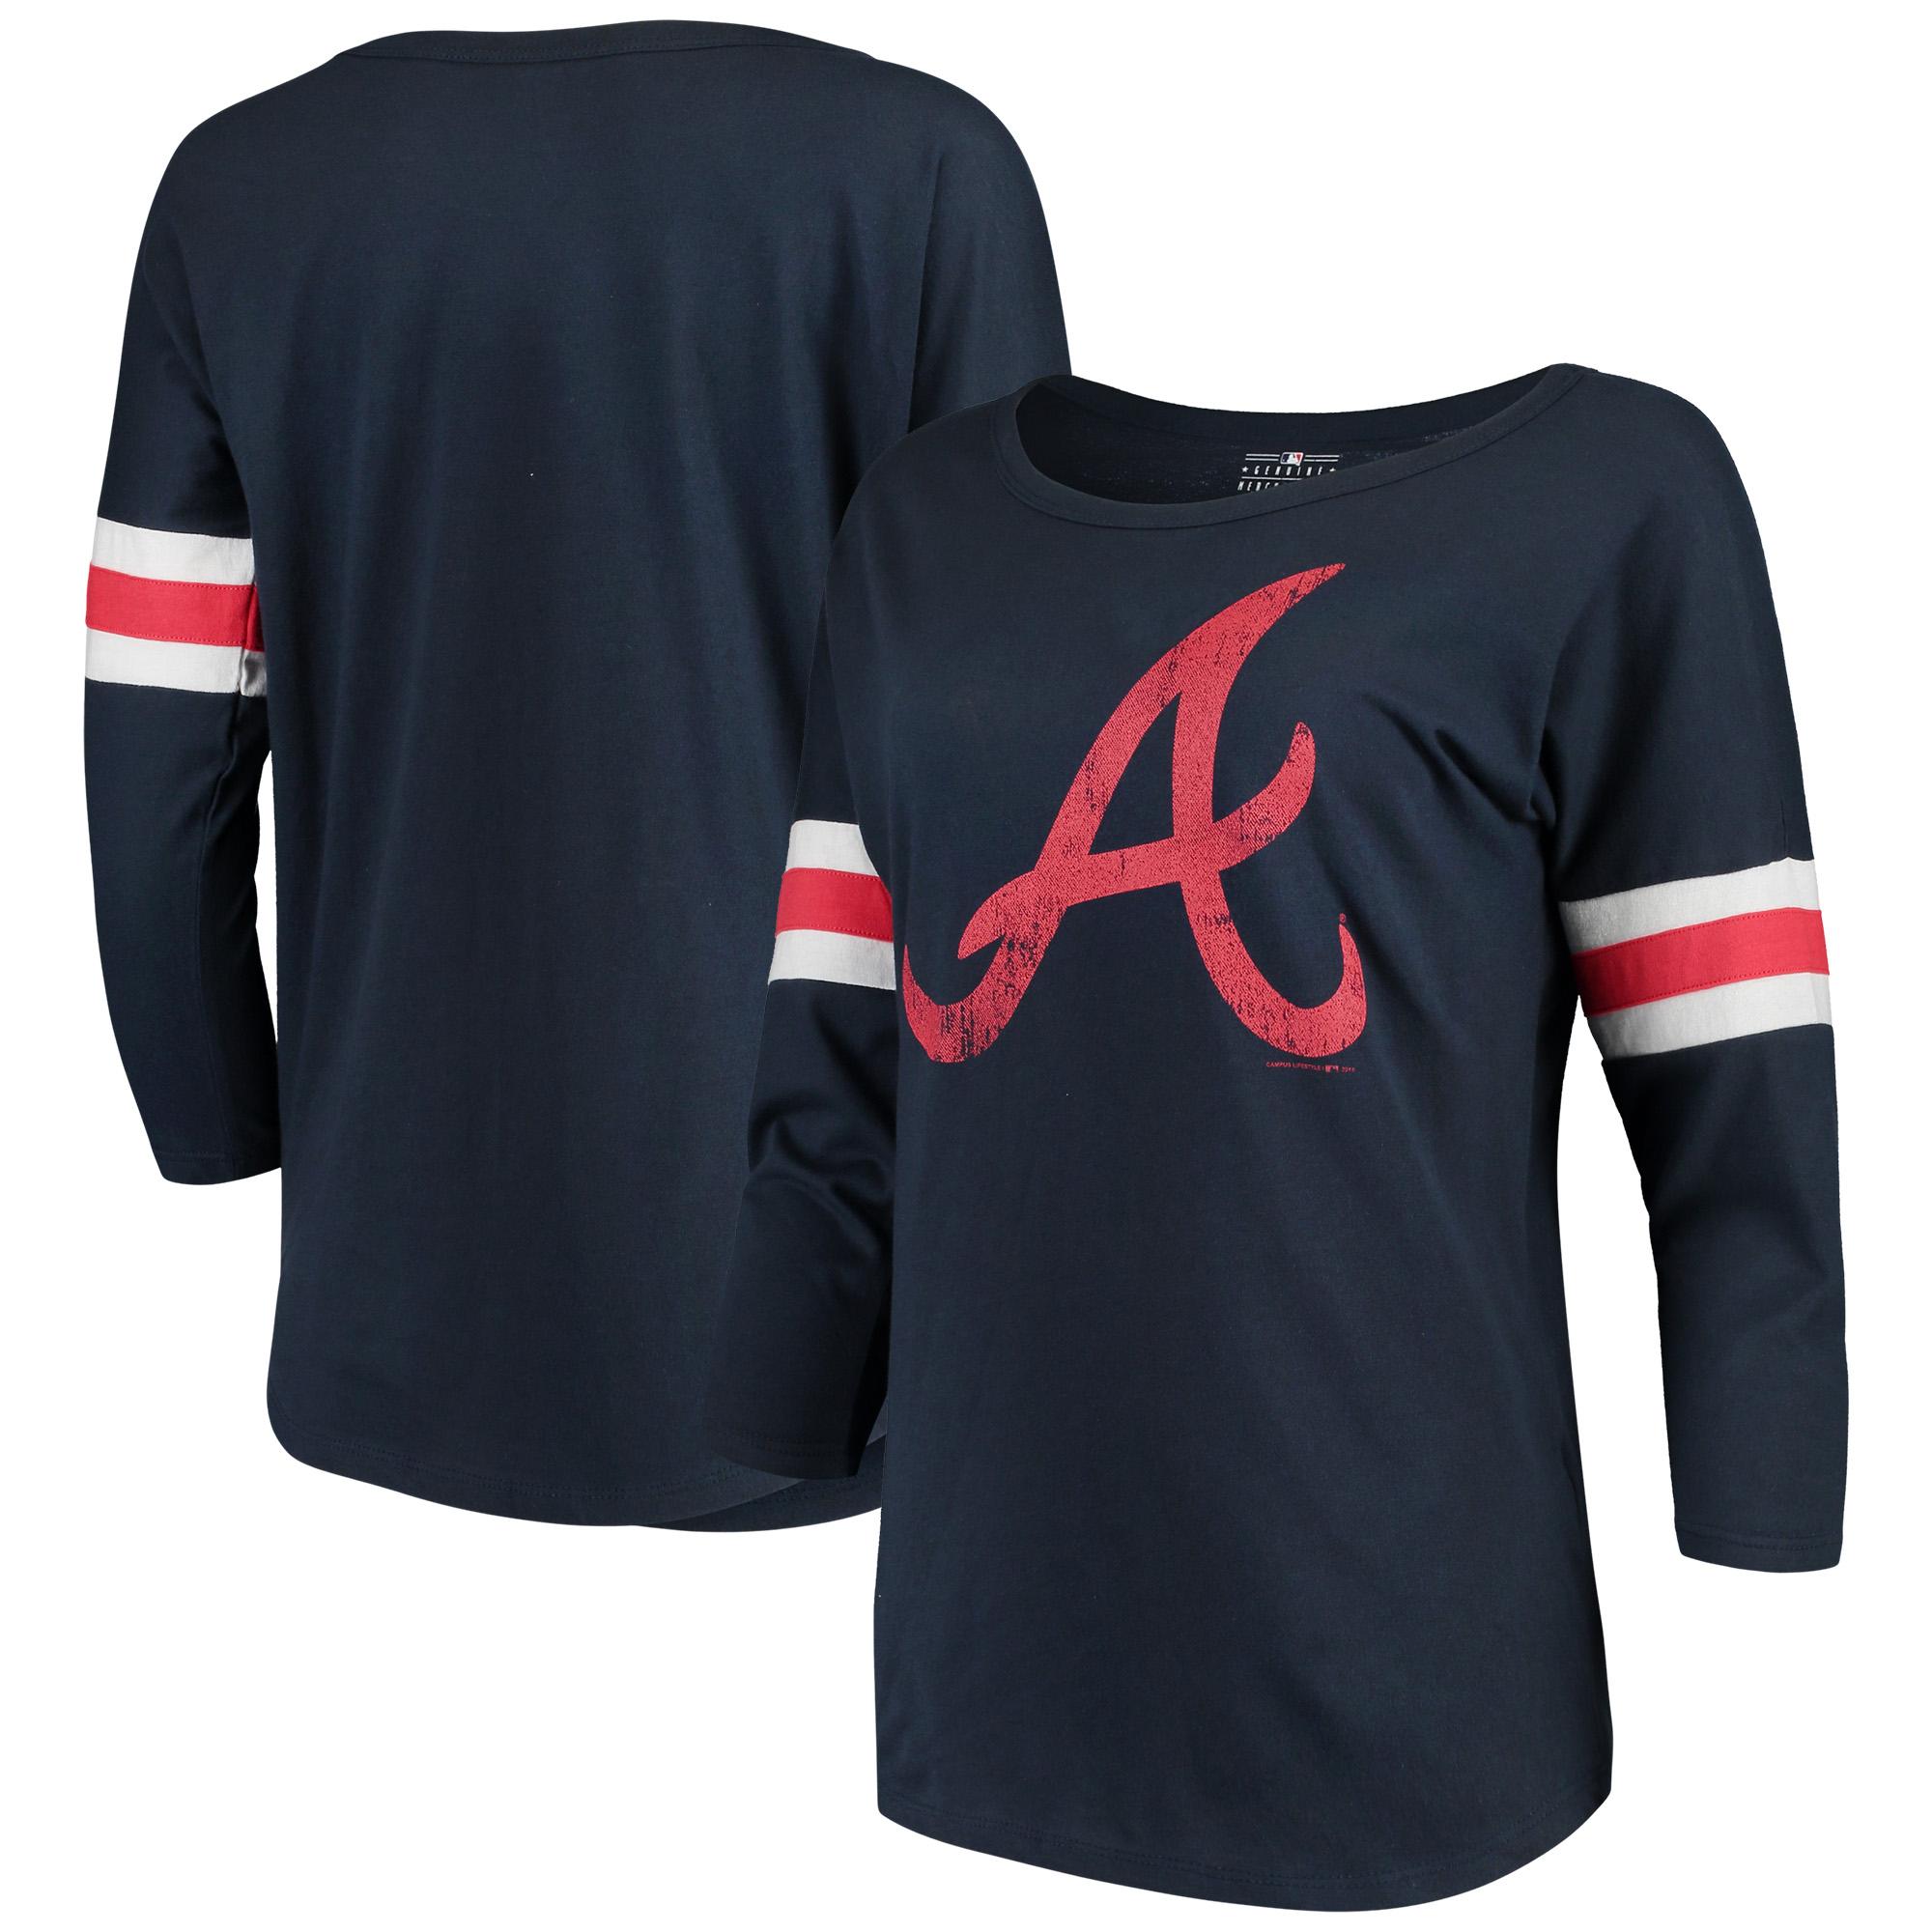 Women's New Era Navy Atlanta Braves Scoop Neck 3/4-Sleeve T-Shirt